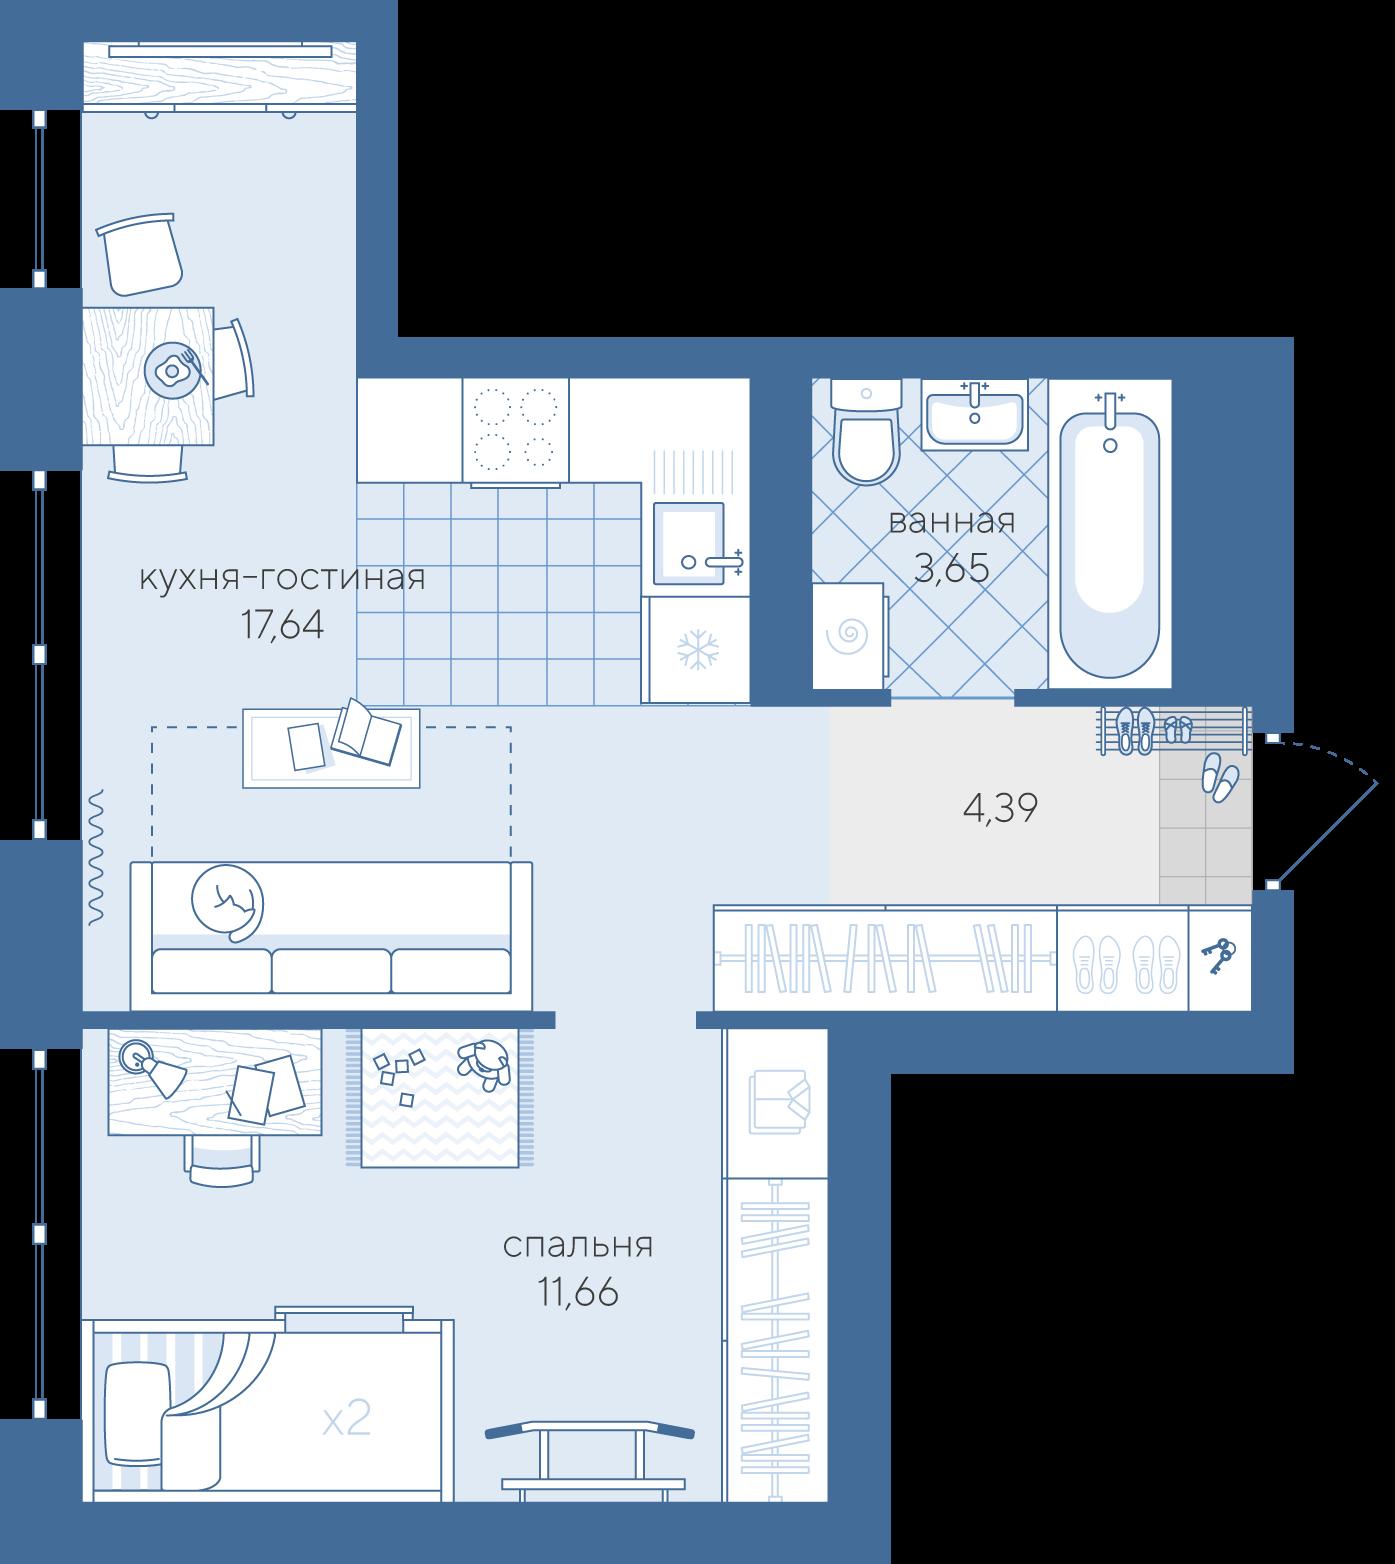 1 комнатная квартира  в районе Лесобаза, ул. Не присвоена, 246, ЖК «Скандиа - квартал у озера», г. Тюмень